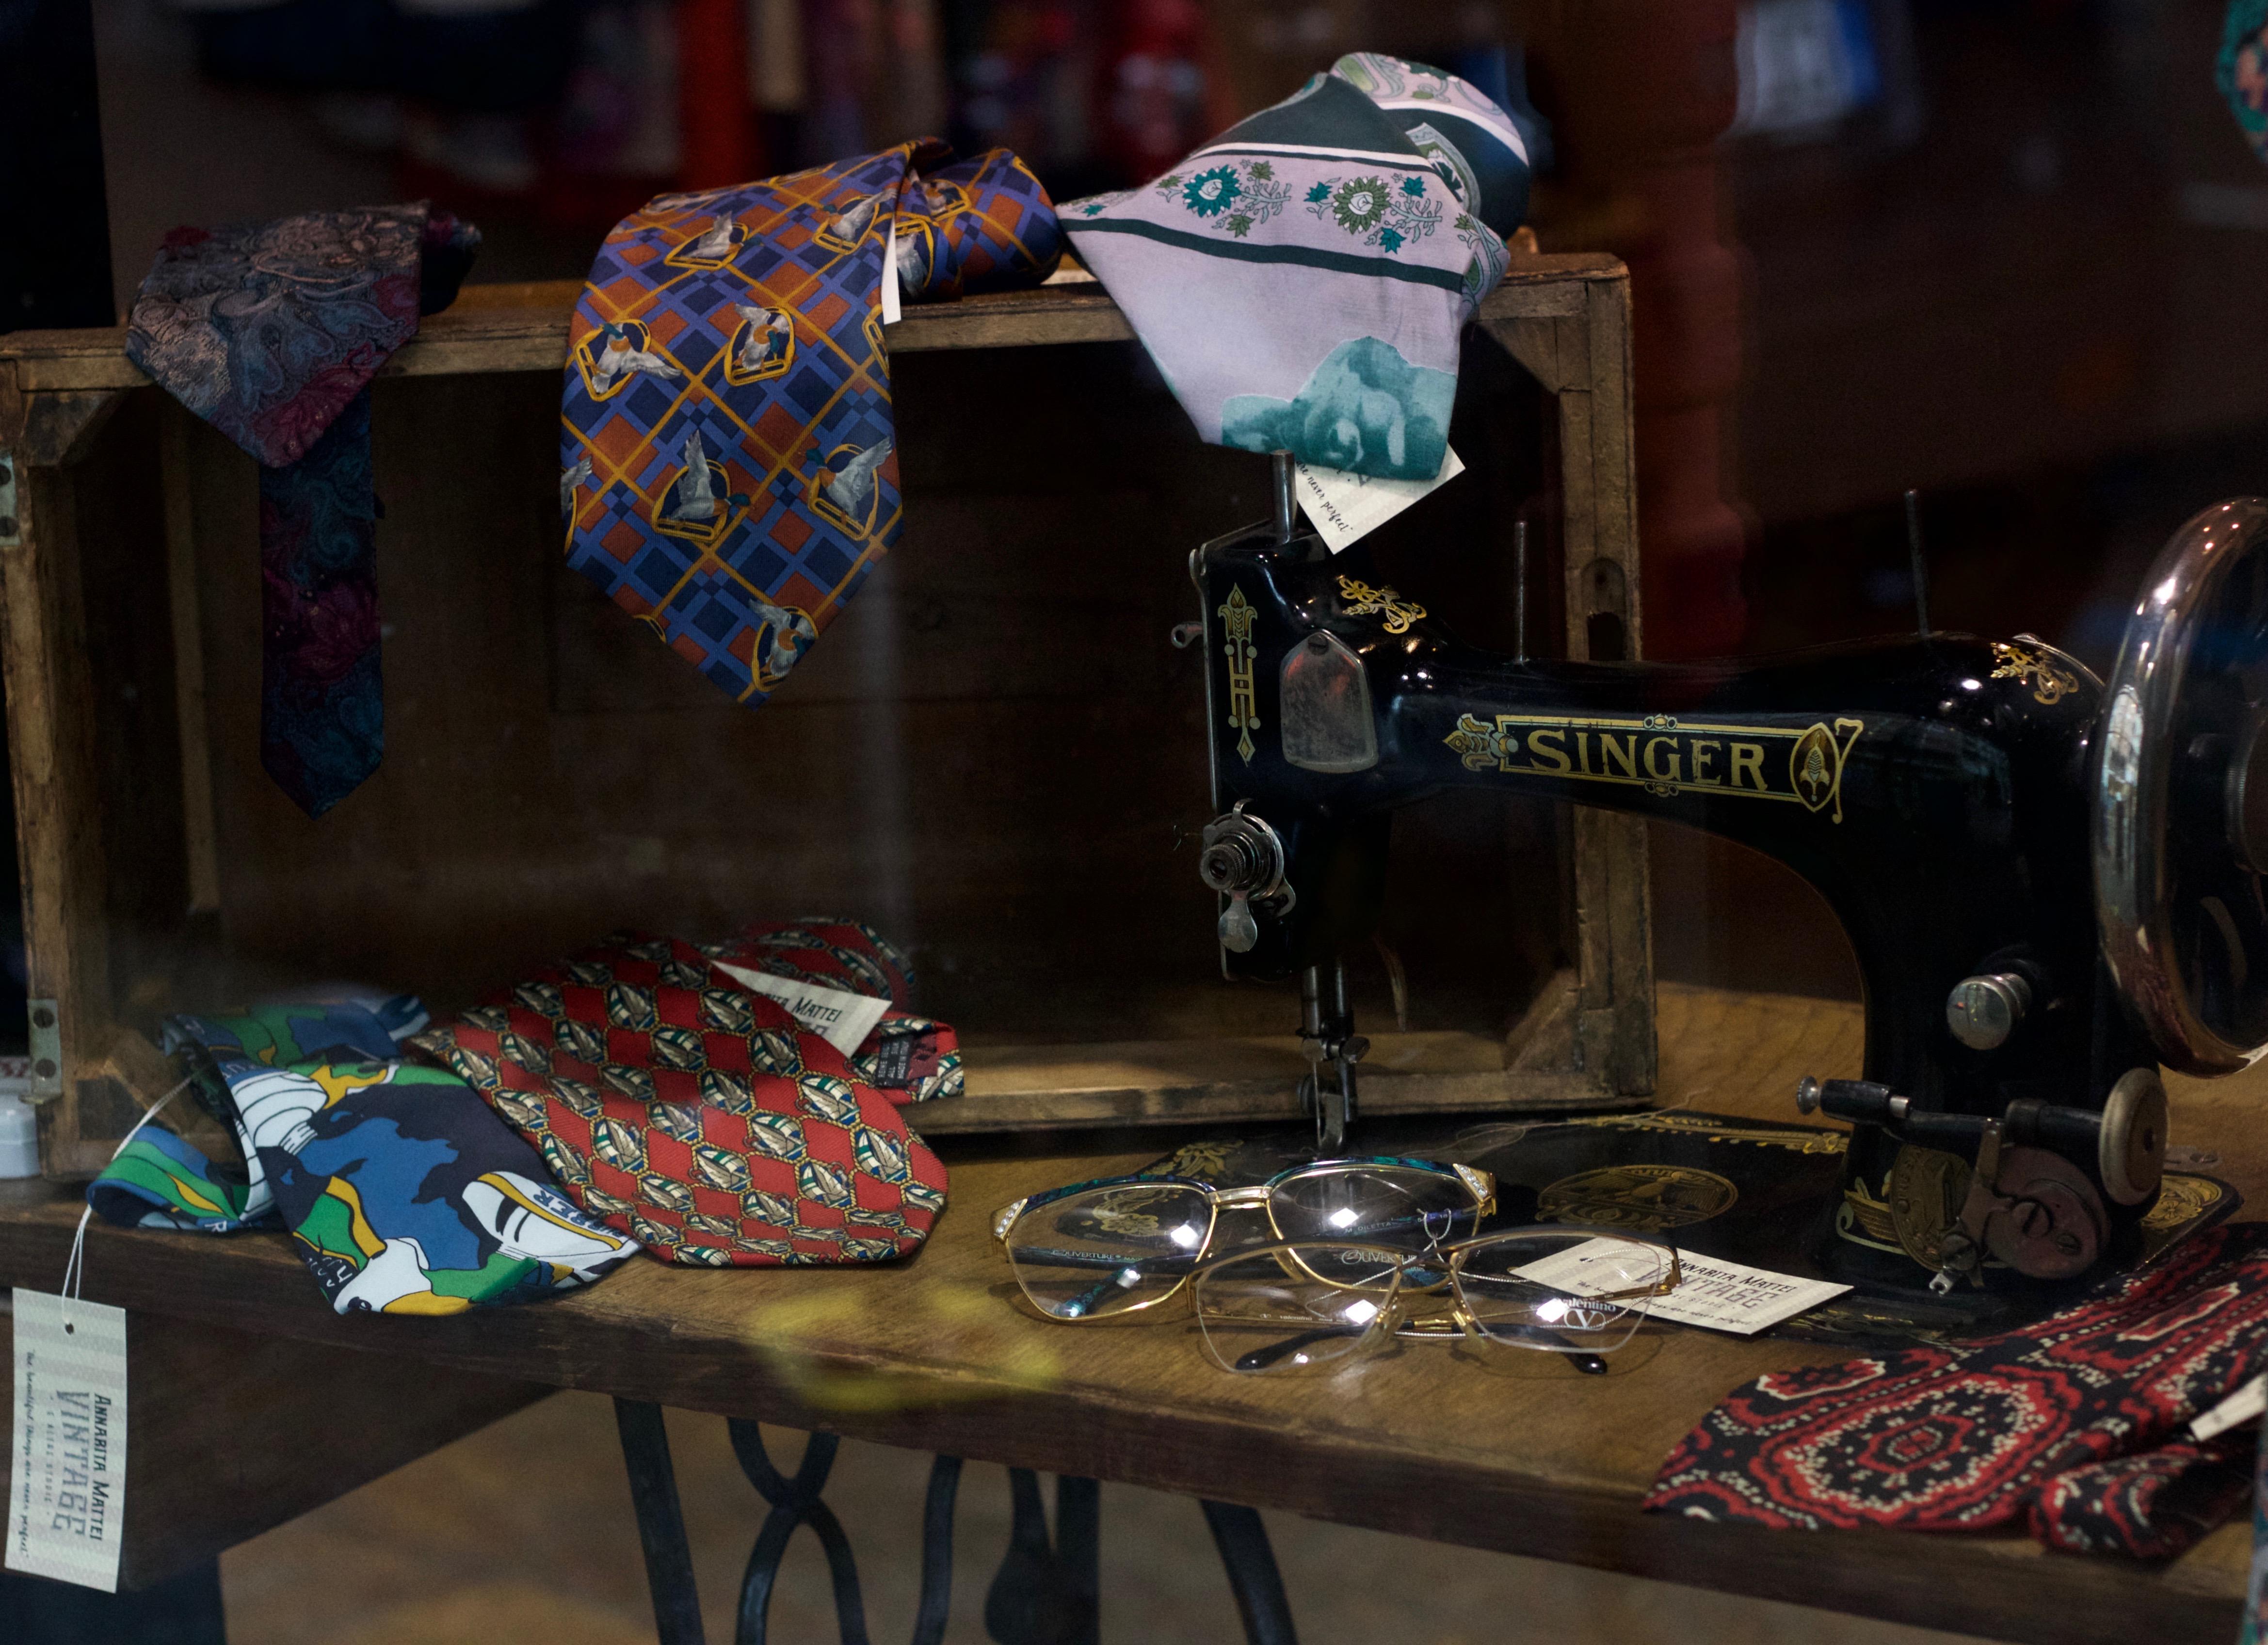 boutique vintage a torino, onemoreaddiction, vintage a torino, lifestyleblogger torino, giulia napoli